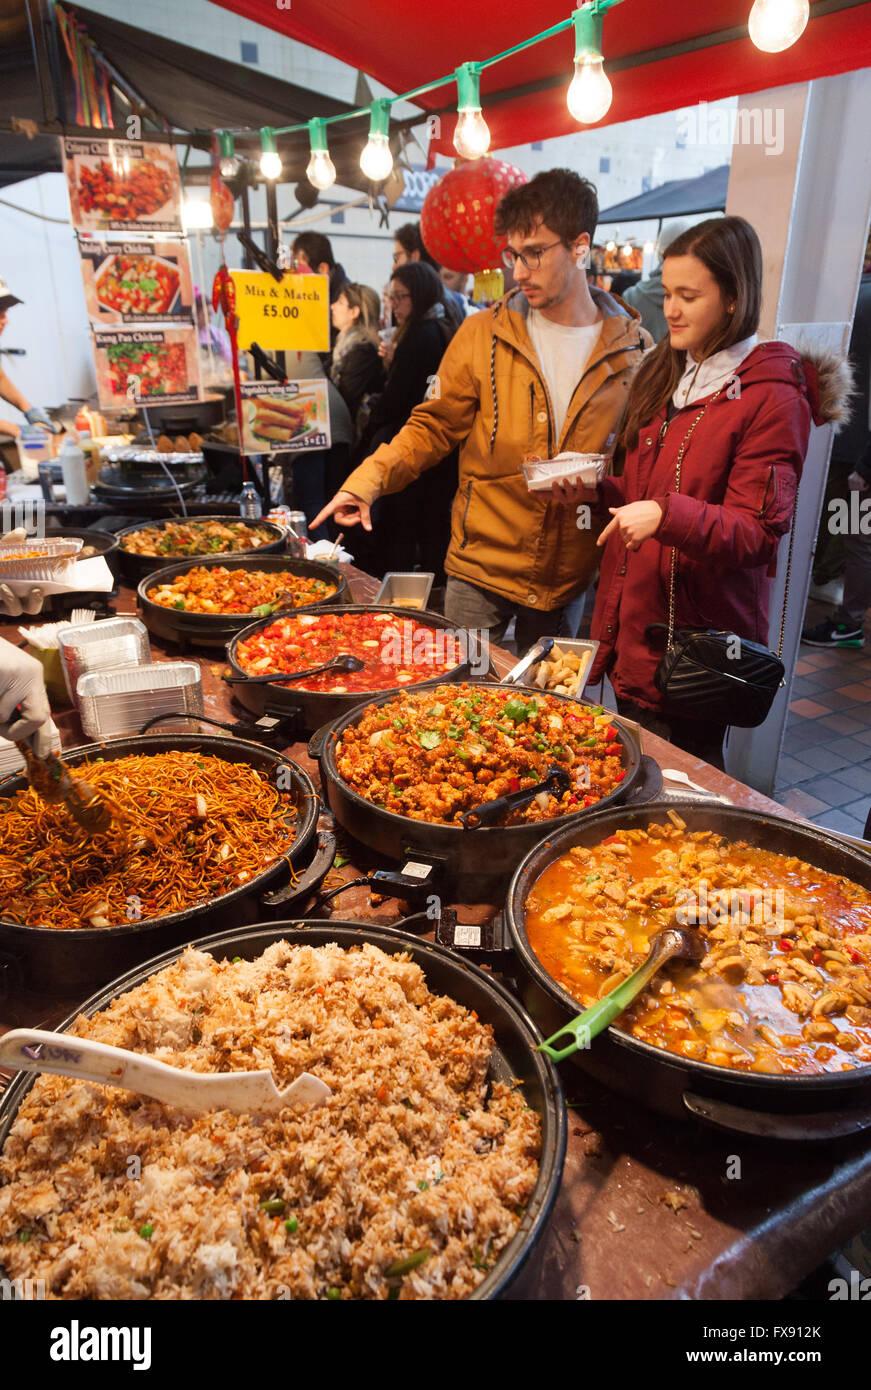 people-buying-food-at-a-chinese-street-food-stall-brick-lane-sunday-FX912K.jpg